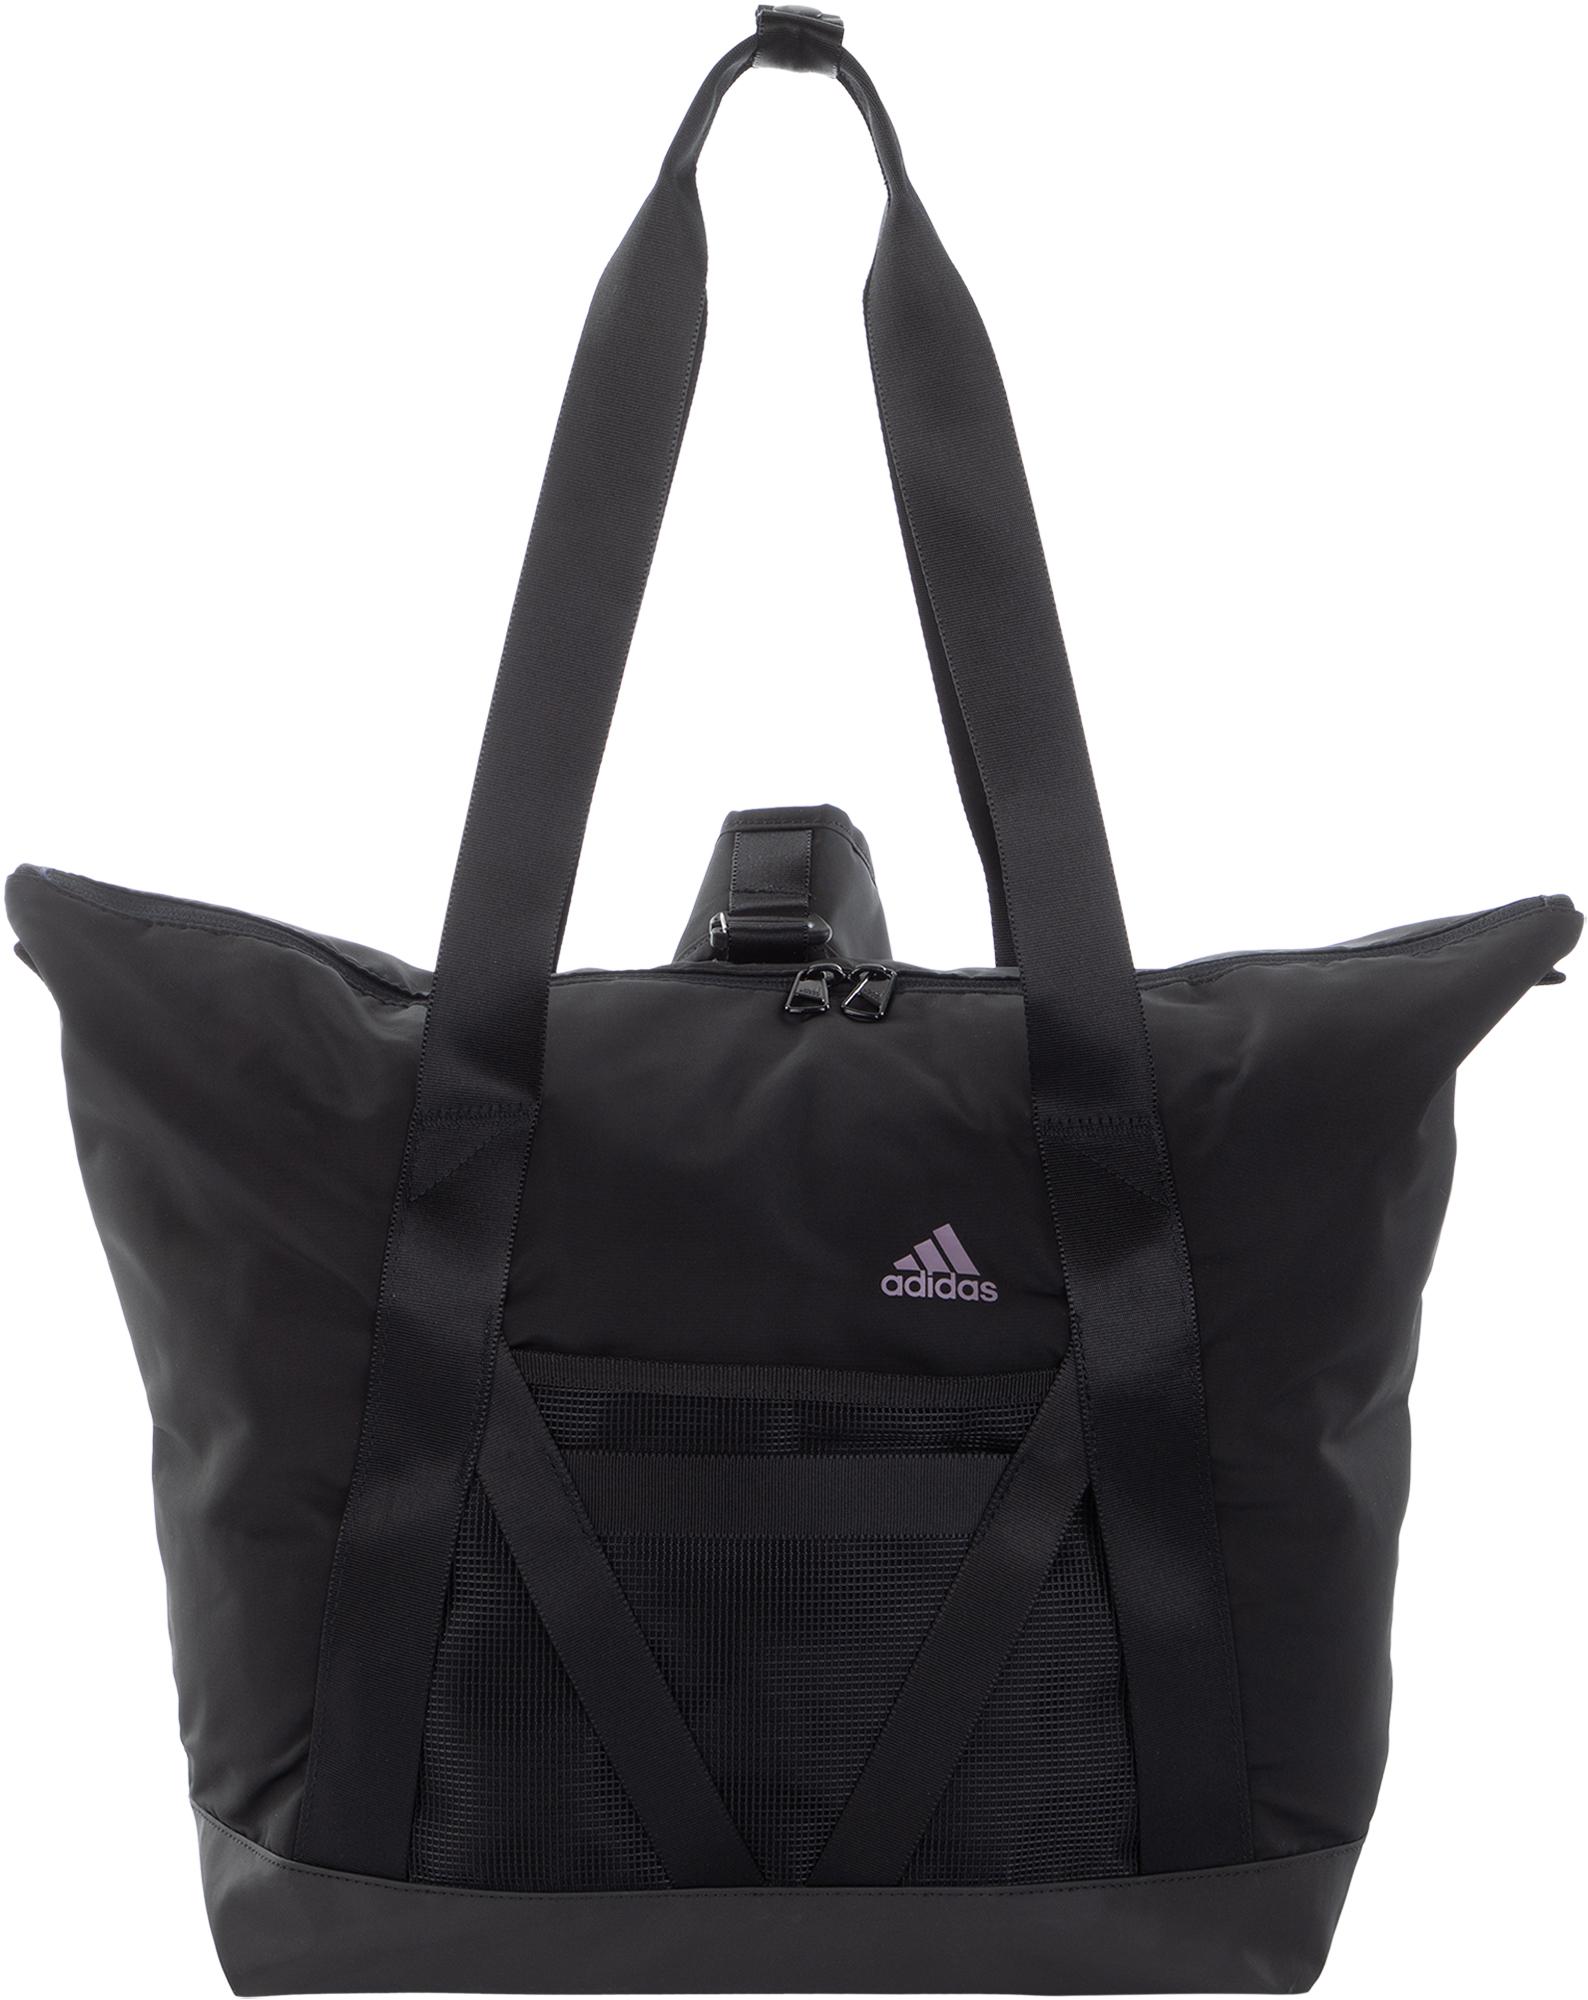 Adidas Сумка женская Adidas ID Tote tote bag with tassel